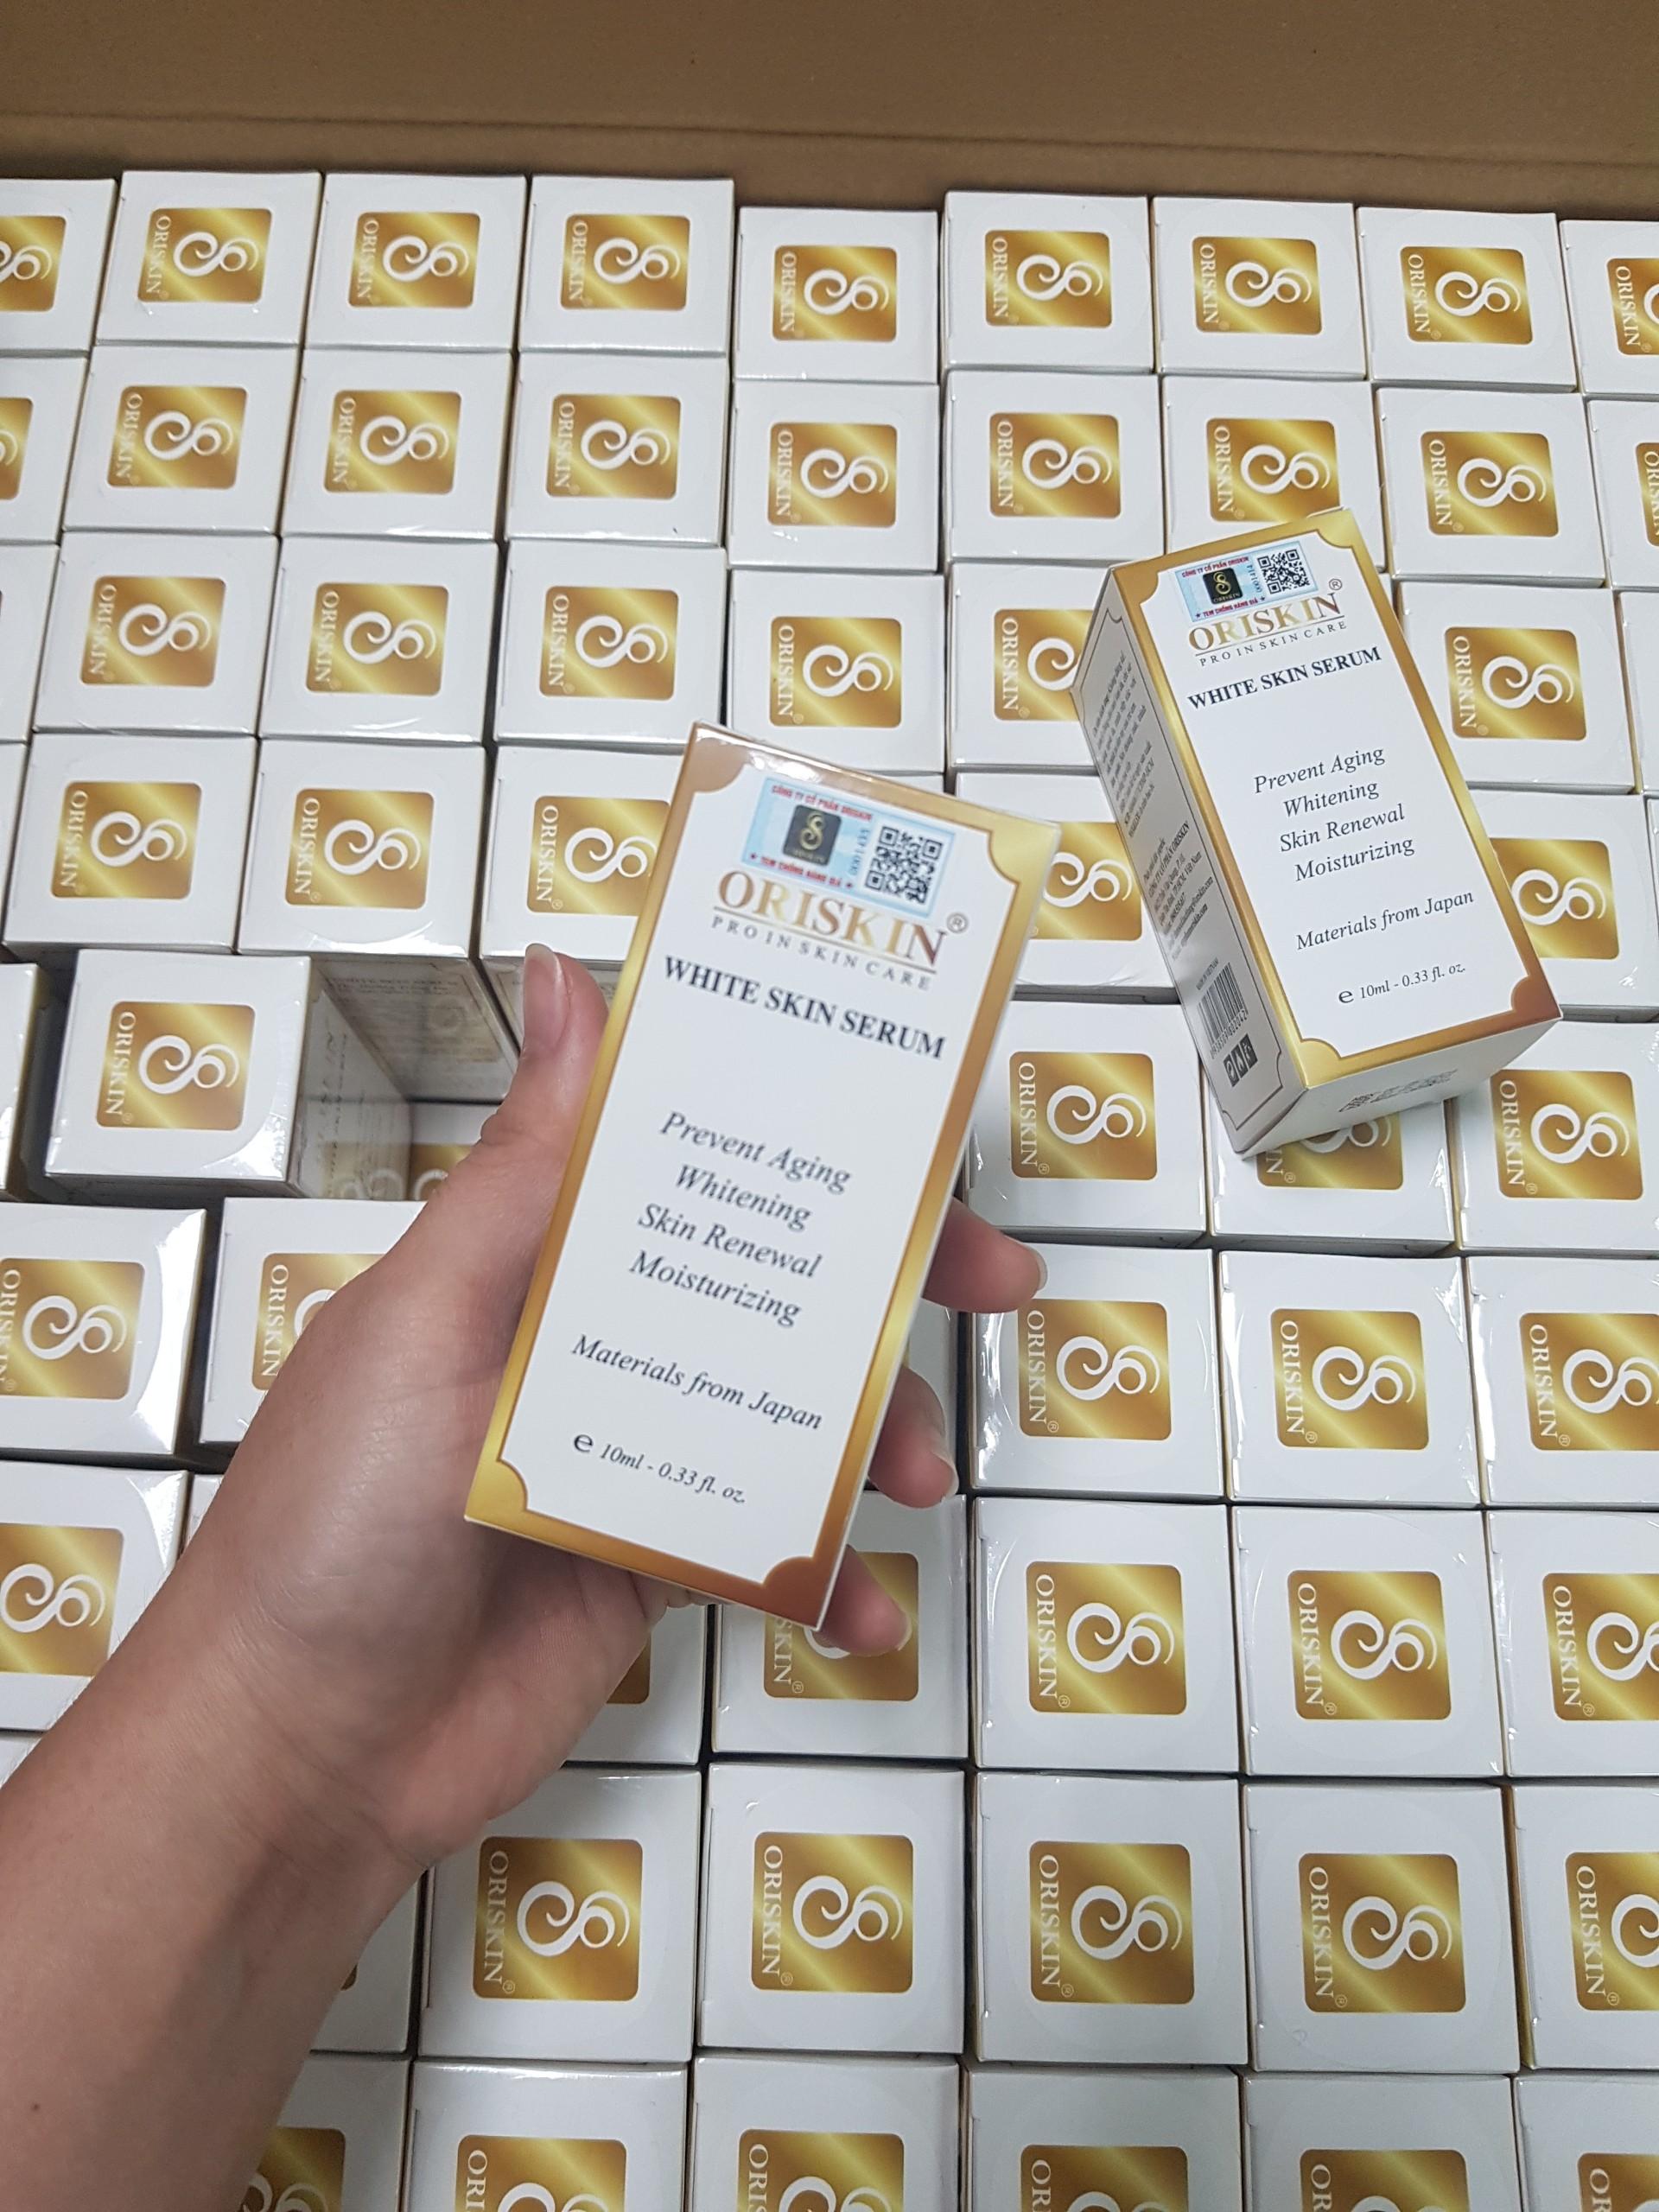 SERUM PHỤC HỒI - DƯỠNG TRẮNG DA ORISKIN WHITE SKIN SERUM Mini 10ml